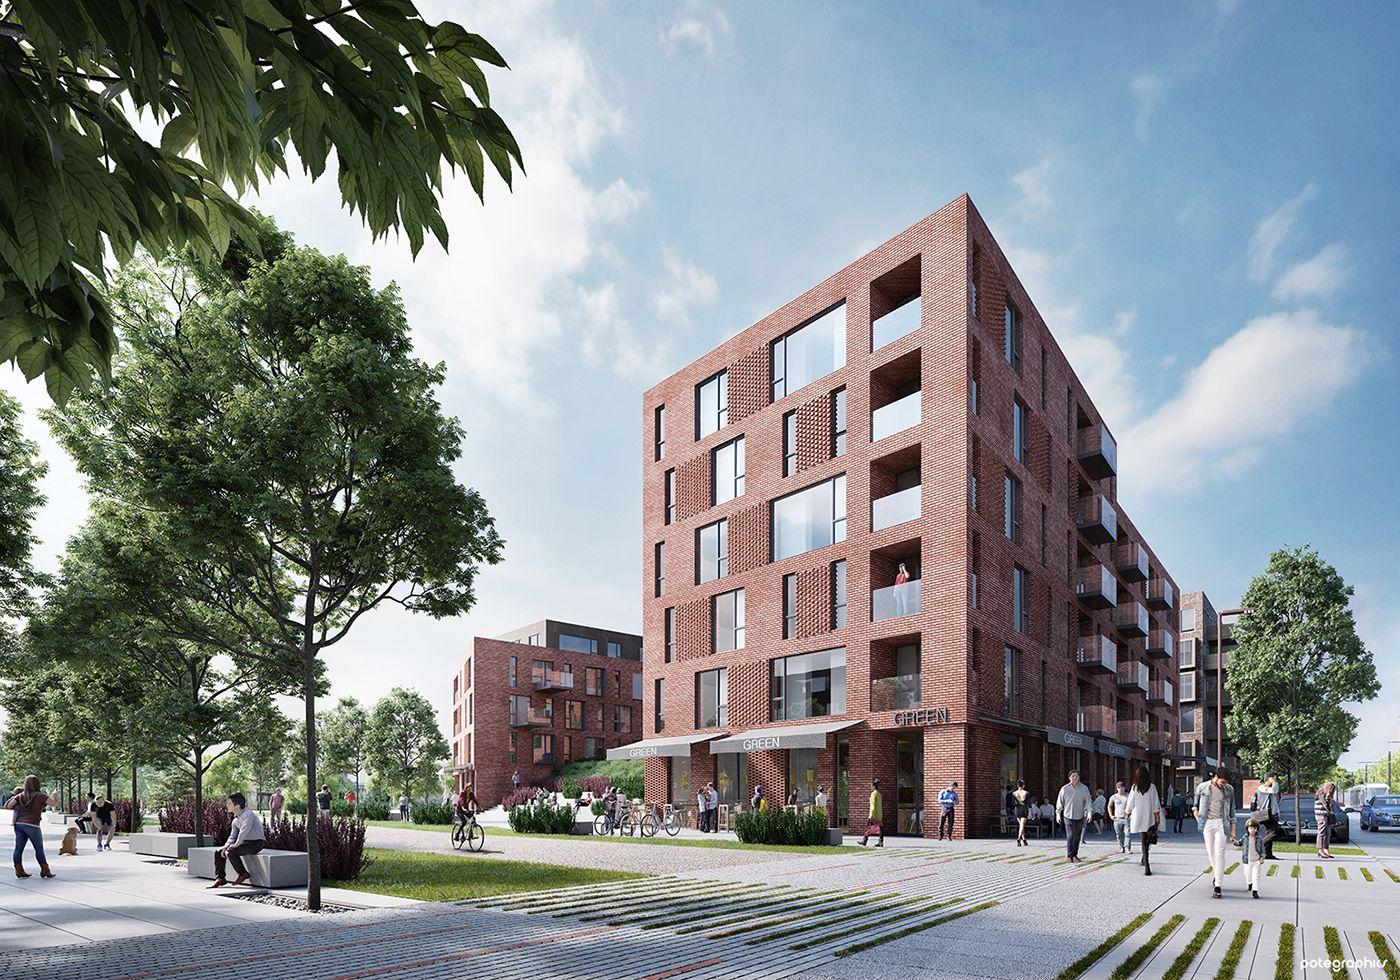 Torunska Housing On Behance Architecture Visualization Brick Facade Architecture